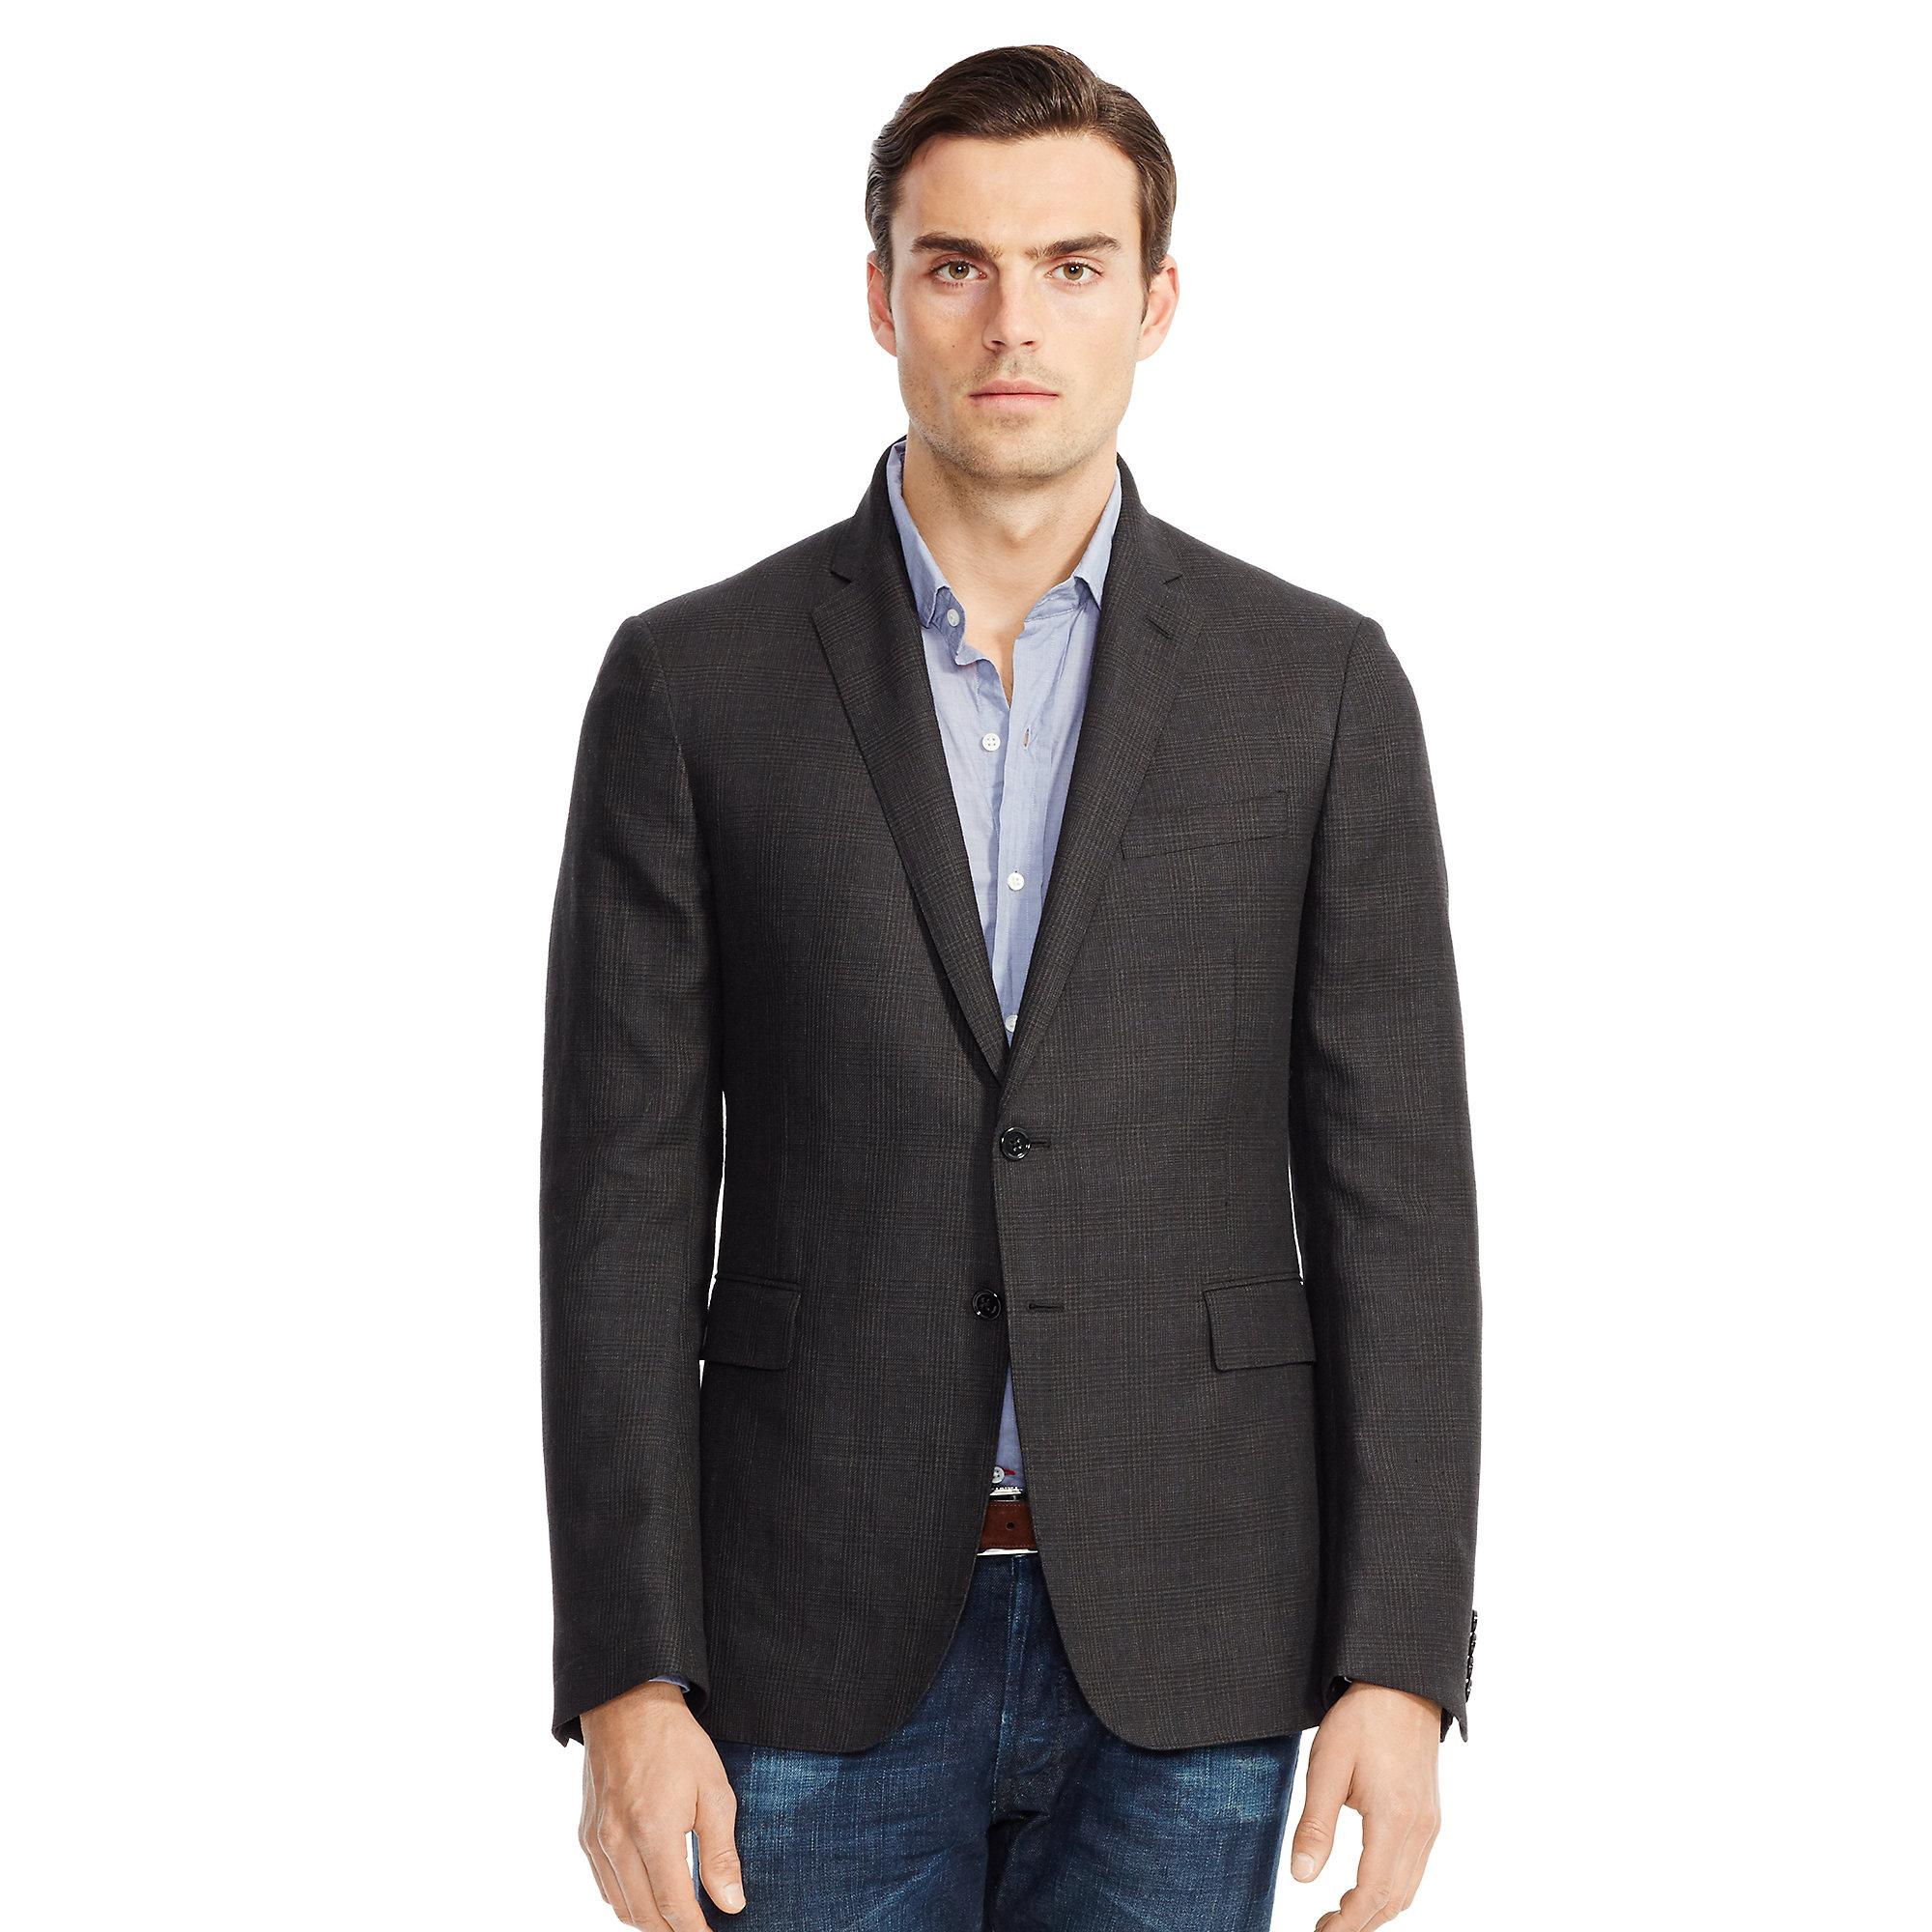 d03eb5c59396 Ralph Lauren Black Label Nigel Glen Plaid Sport Coat in Black for ...